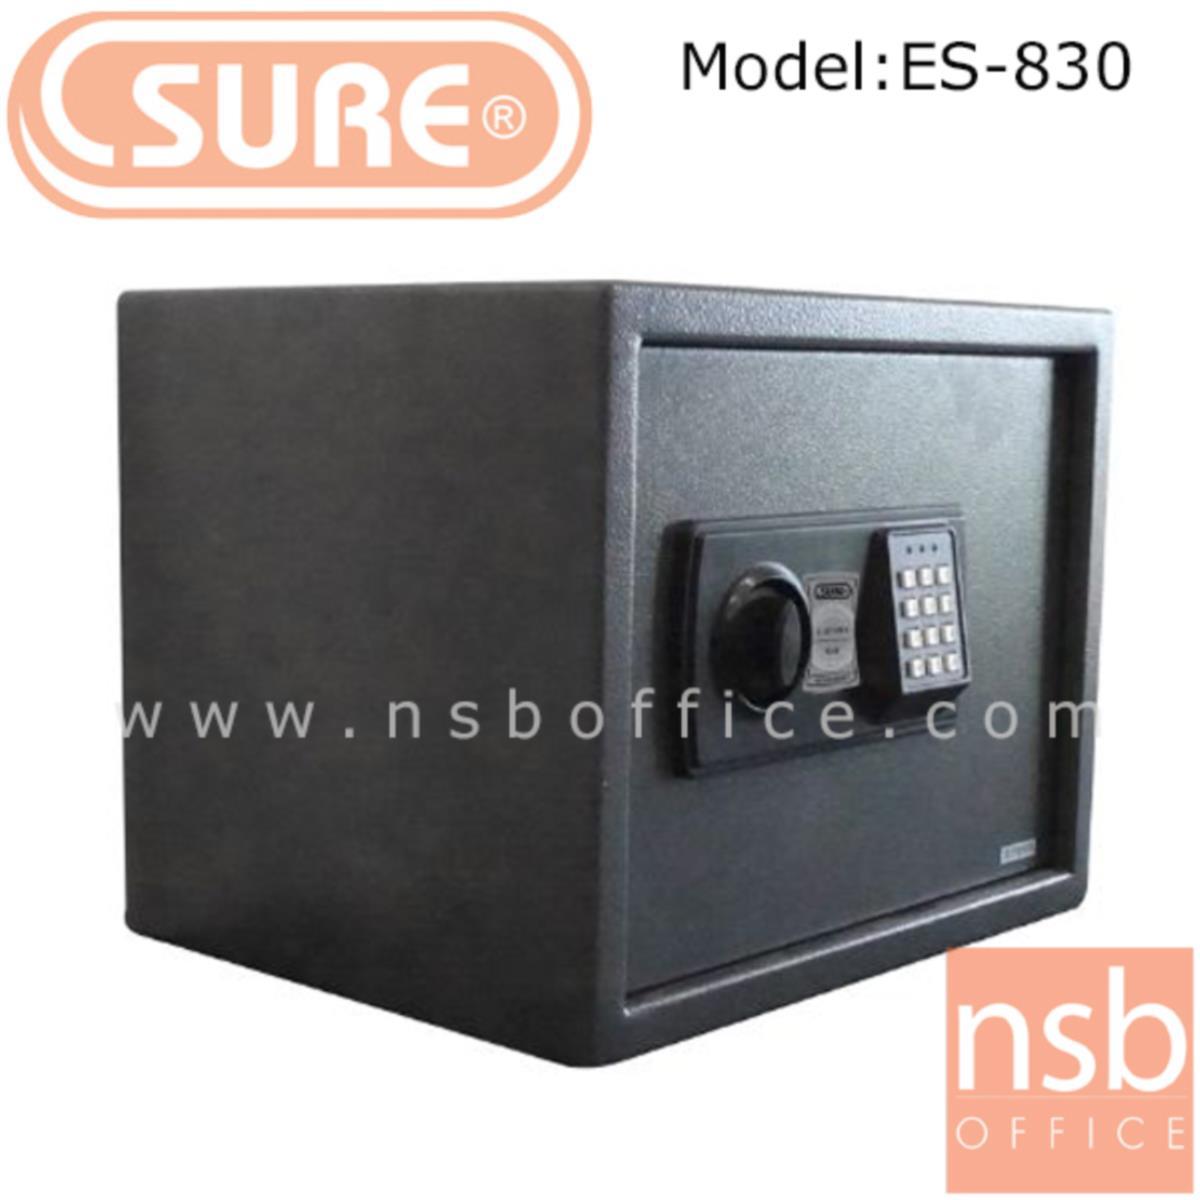 F03A016:ตู้เซฟดิจตอล SR-ES830 น้ำหนัก 11 กก. (1 รหัสกด / ปุ่มหมุนบิด)